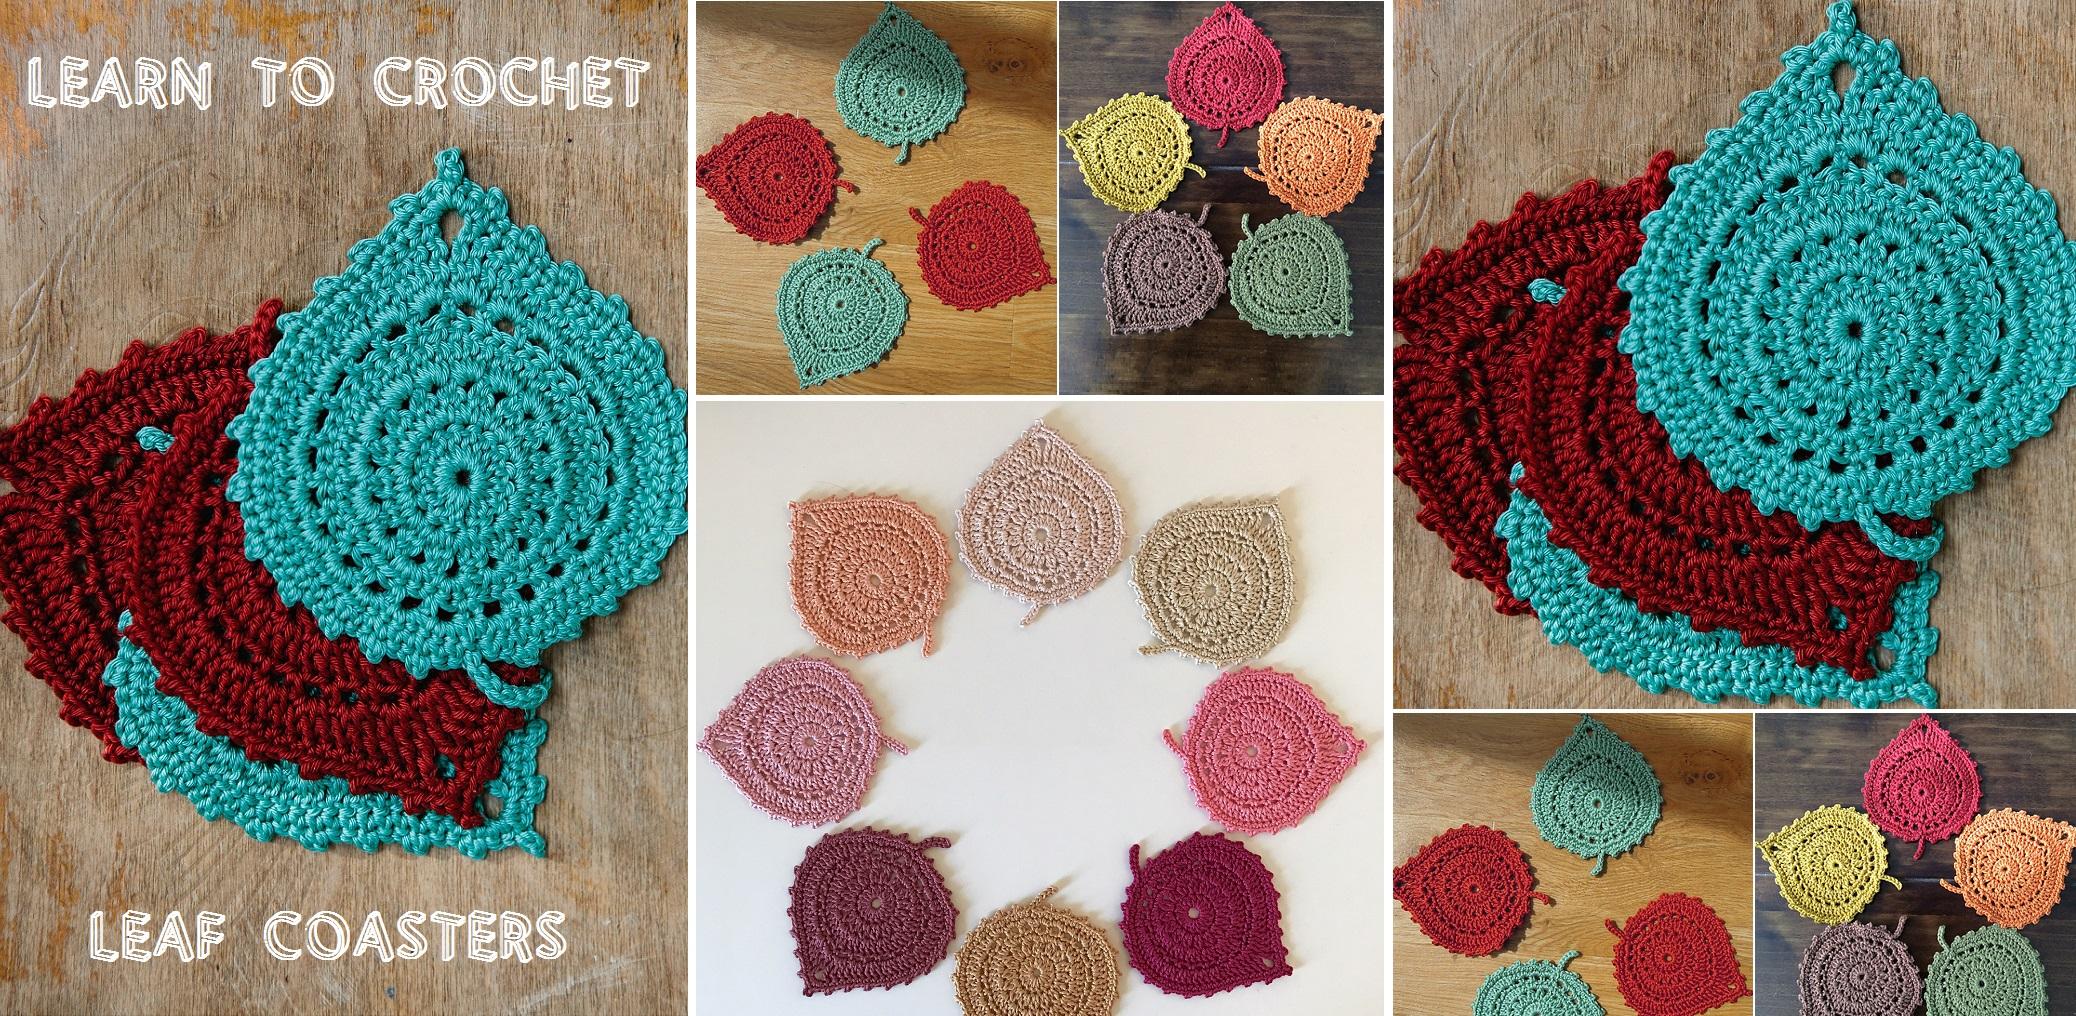 Crochet Leaf Coaster - Design Peak